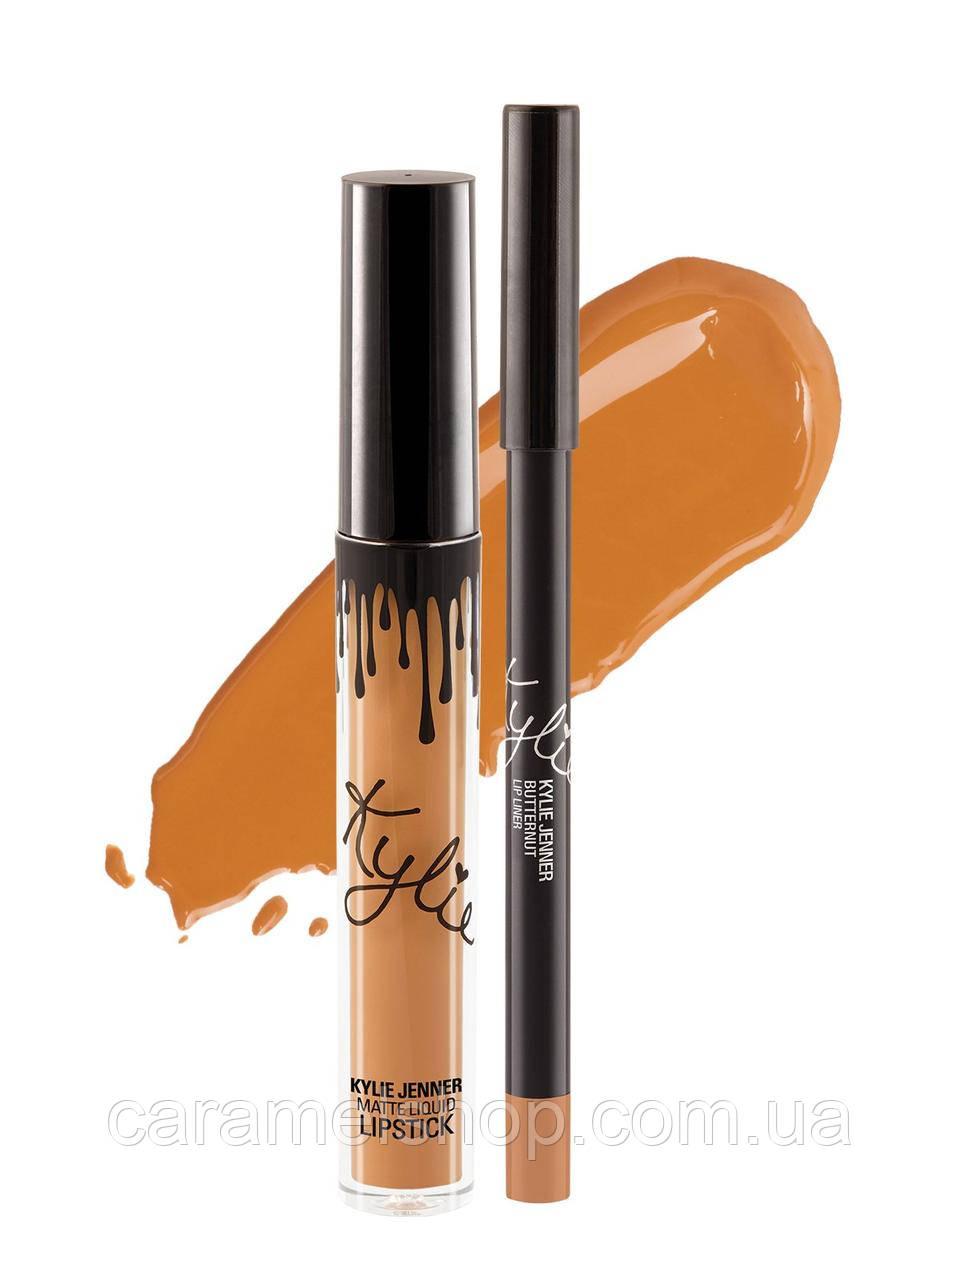 Жидкая матовая помада Kylie 8653 цвет Butternut | Matte Liquid Lipstick реплика